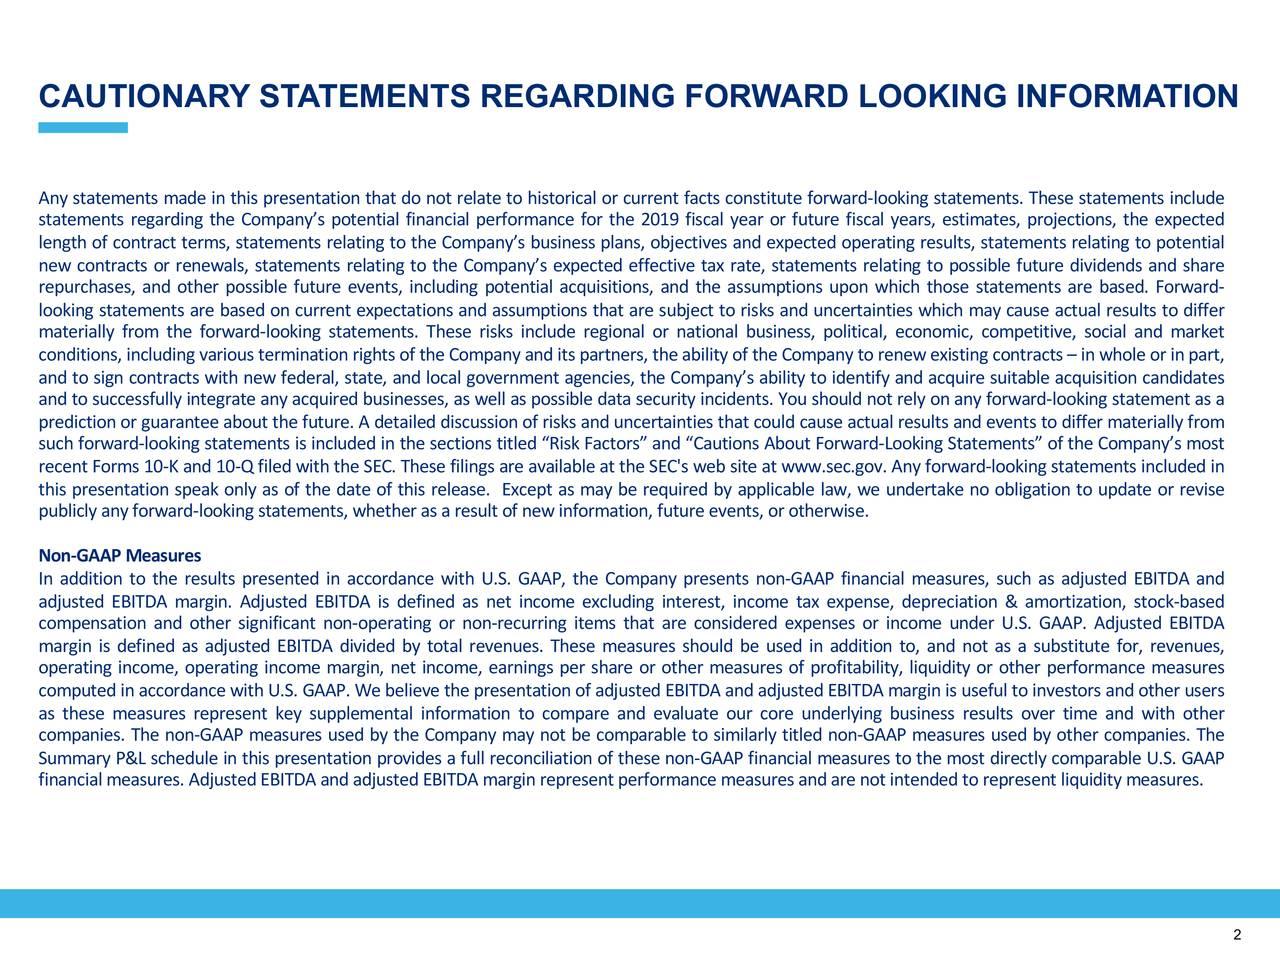 CAUTIONARY STATEMENTS REGARDING FORWARD LOOKING INFORMATION